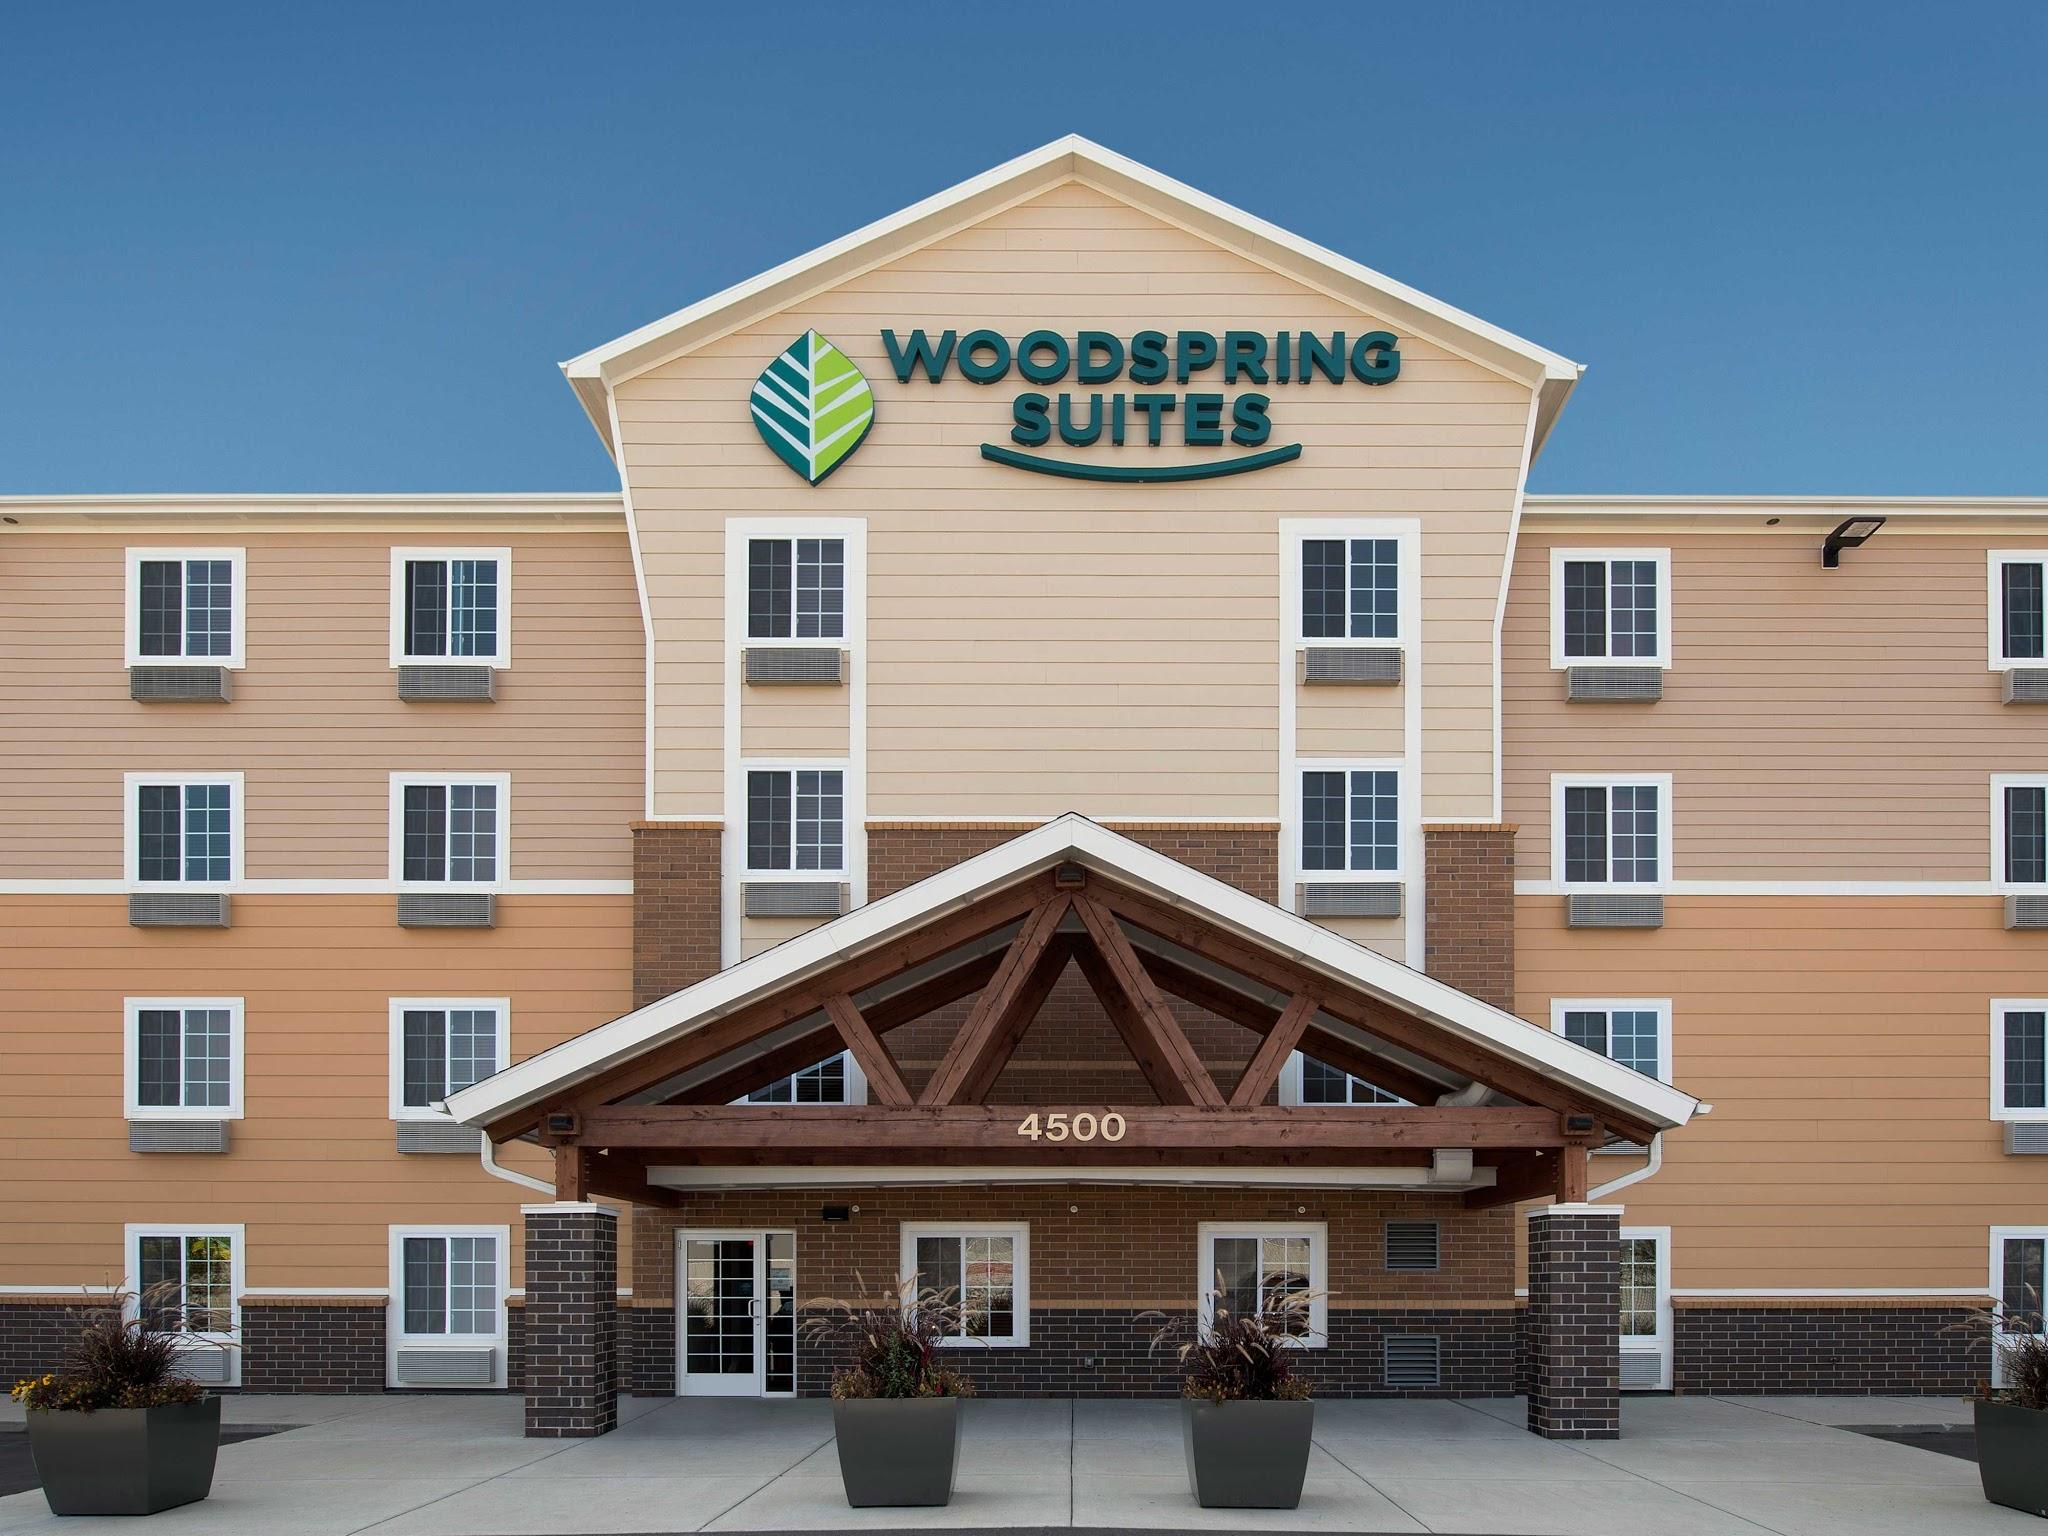 WoodSpring Suites Grand Rapids South image 10